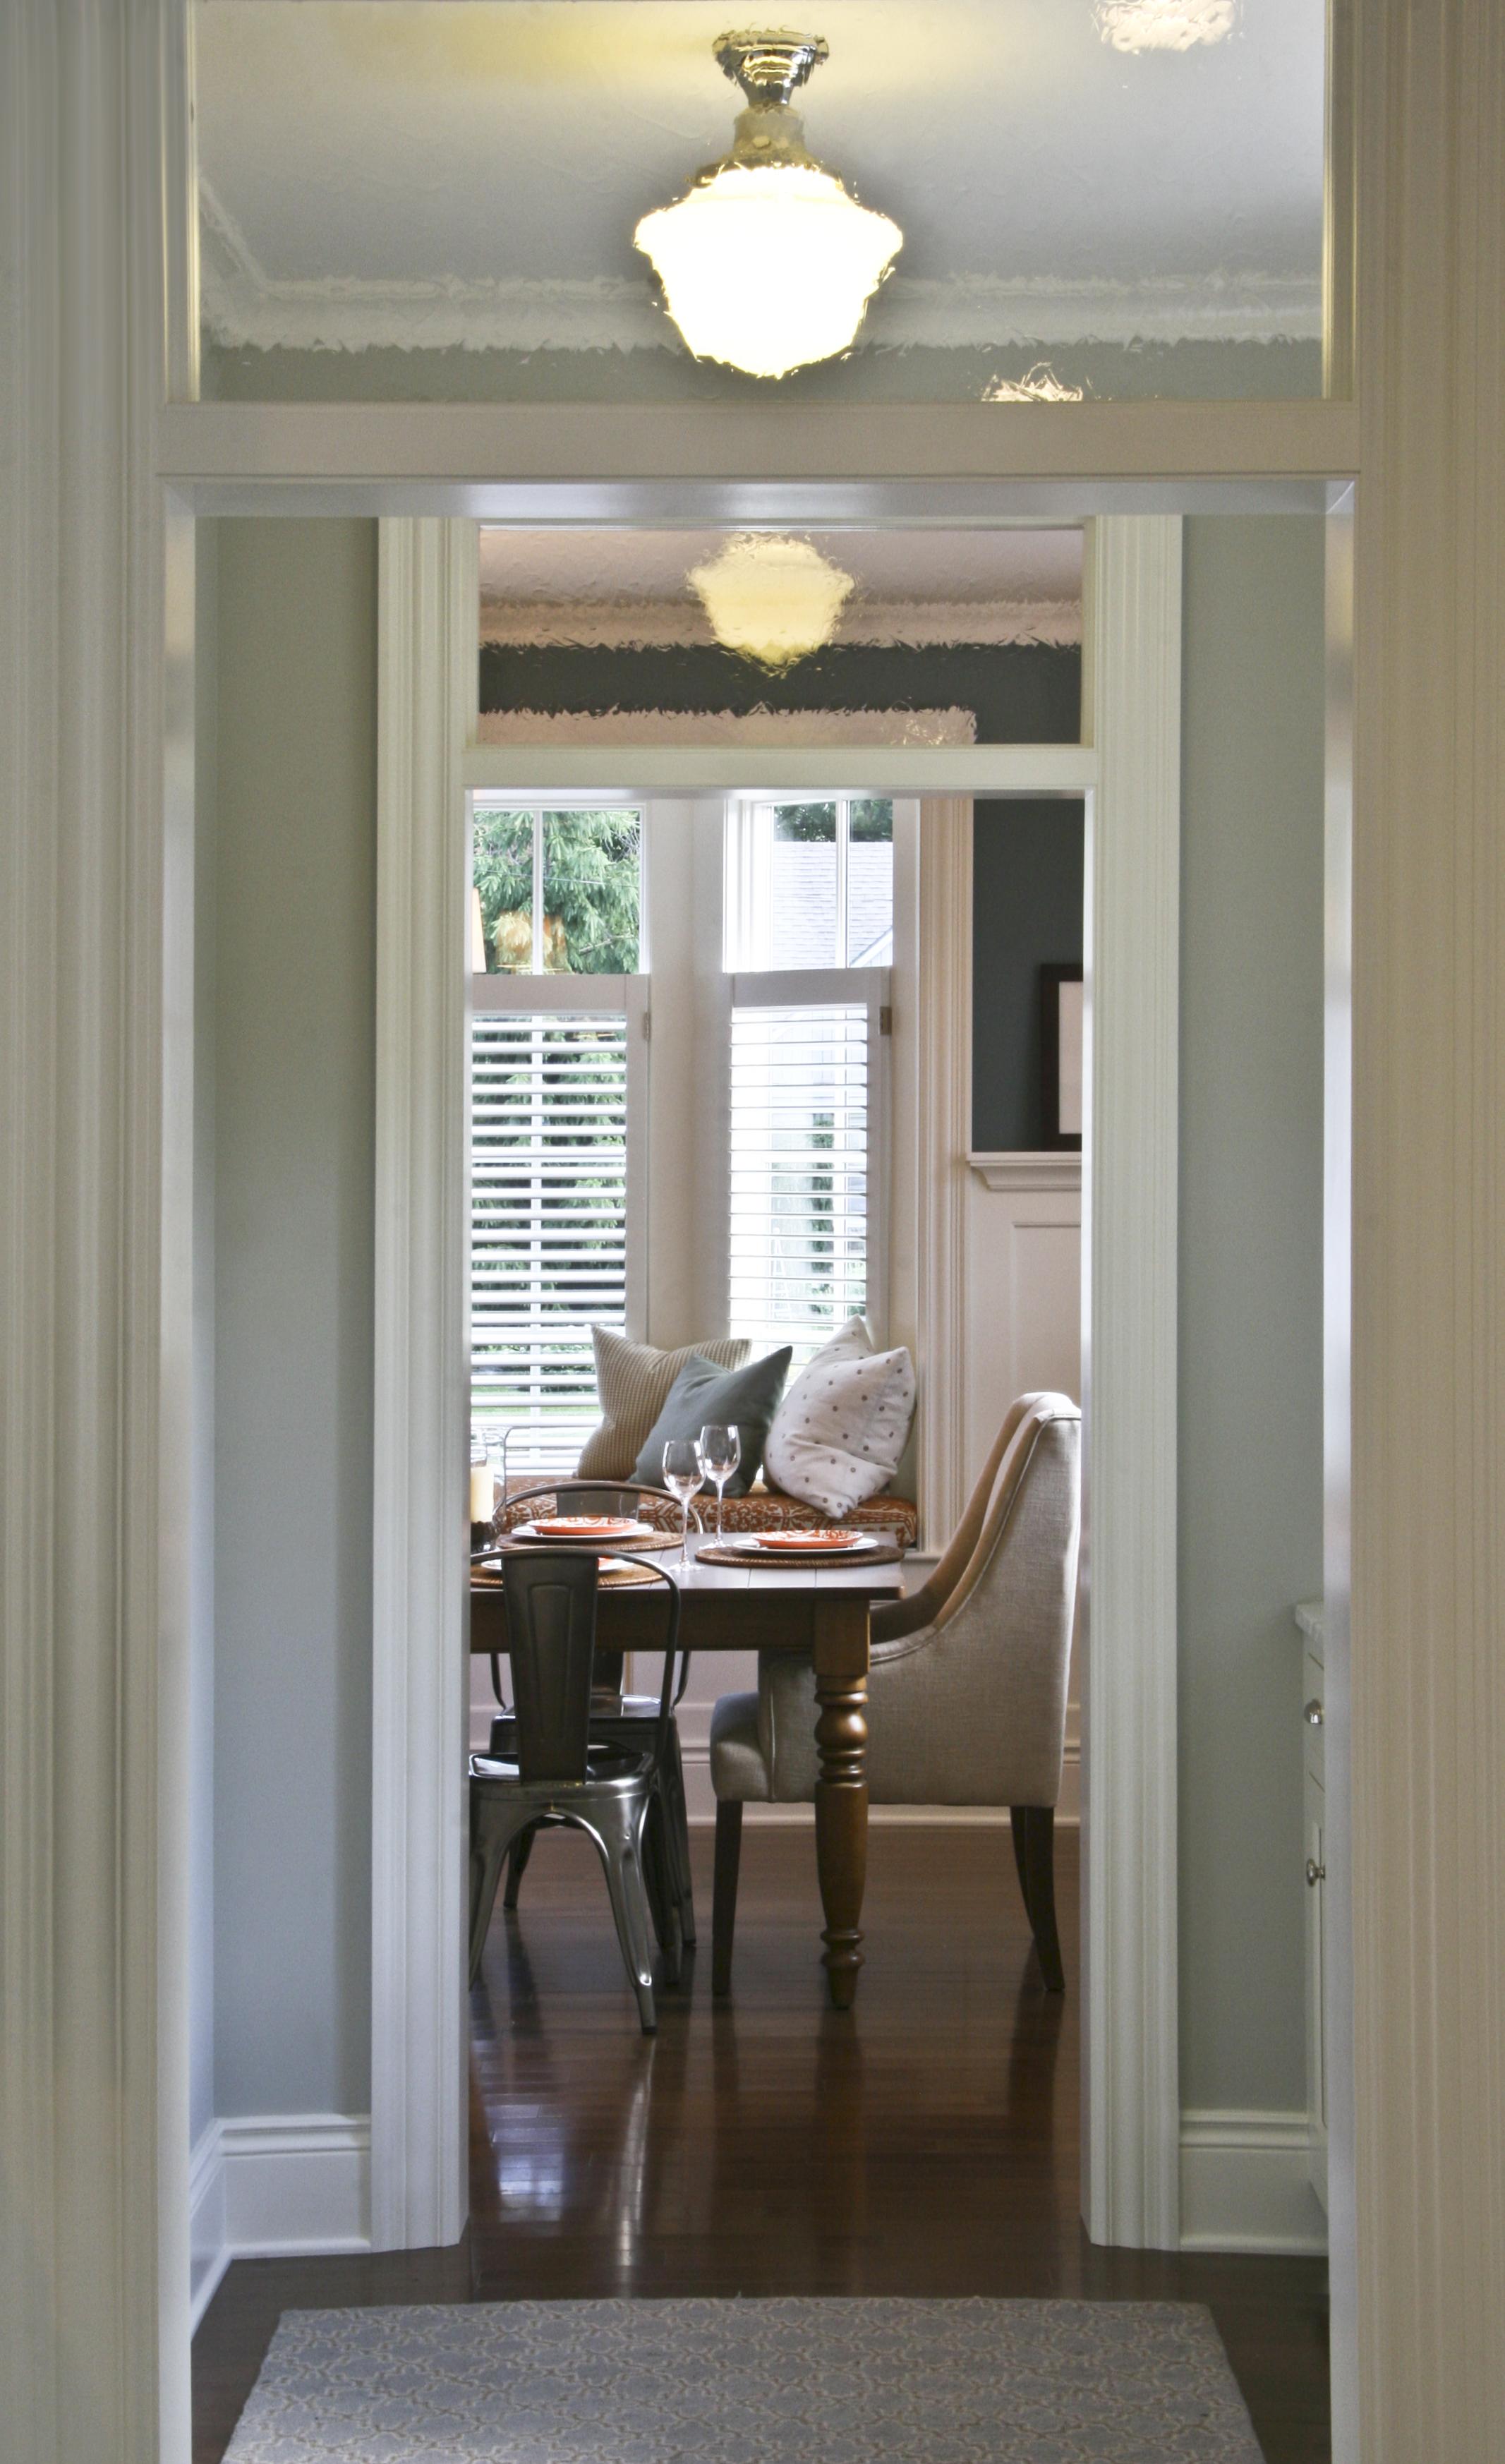 Hallway IMG_3686-1.jpg